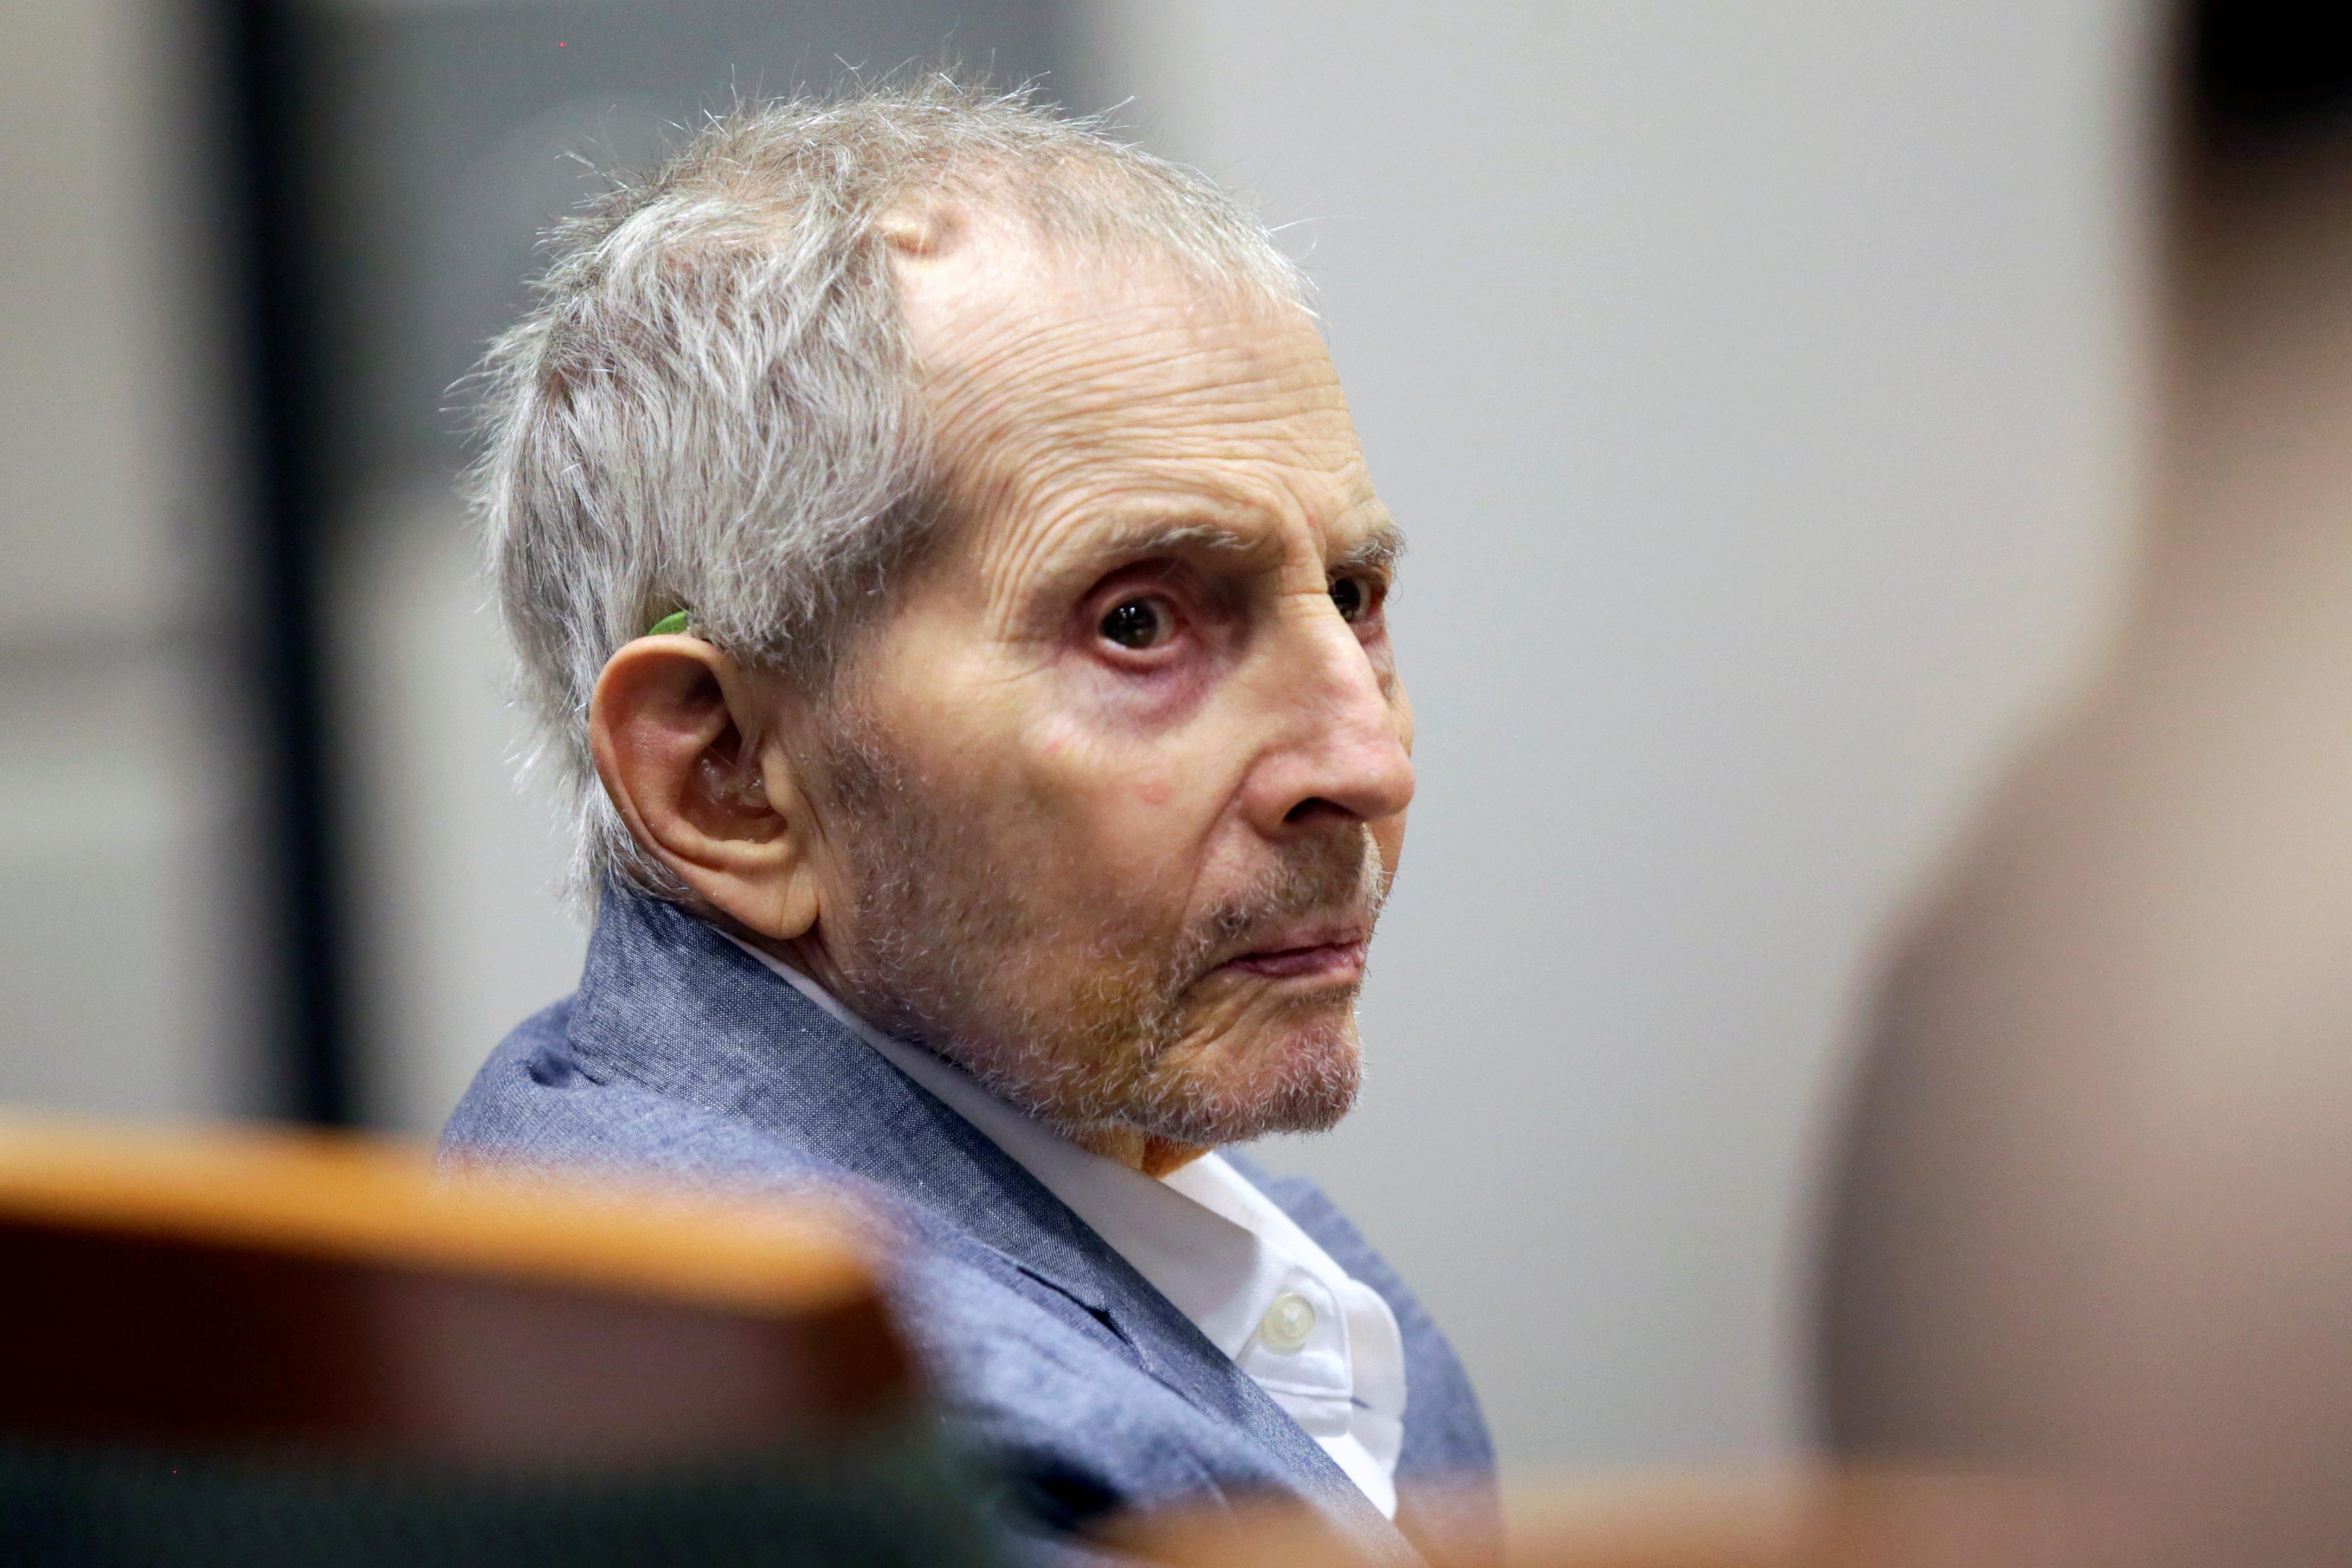 Real estate heir Robert Durst looks over during his murder trial in Los Angeles, California, U.S., March 10, 2020. Alex Gallardo/Pool via Reuters